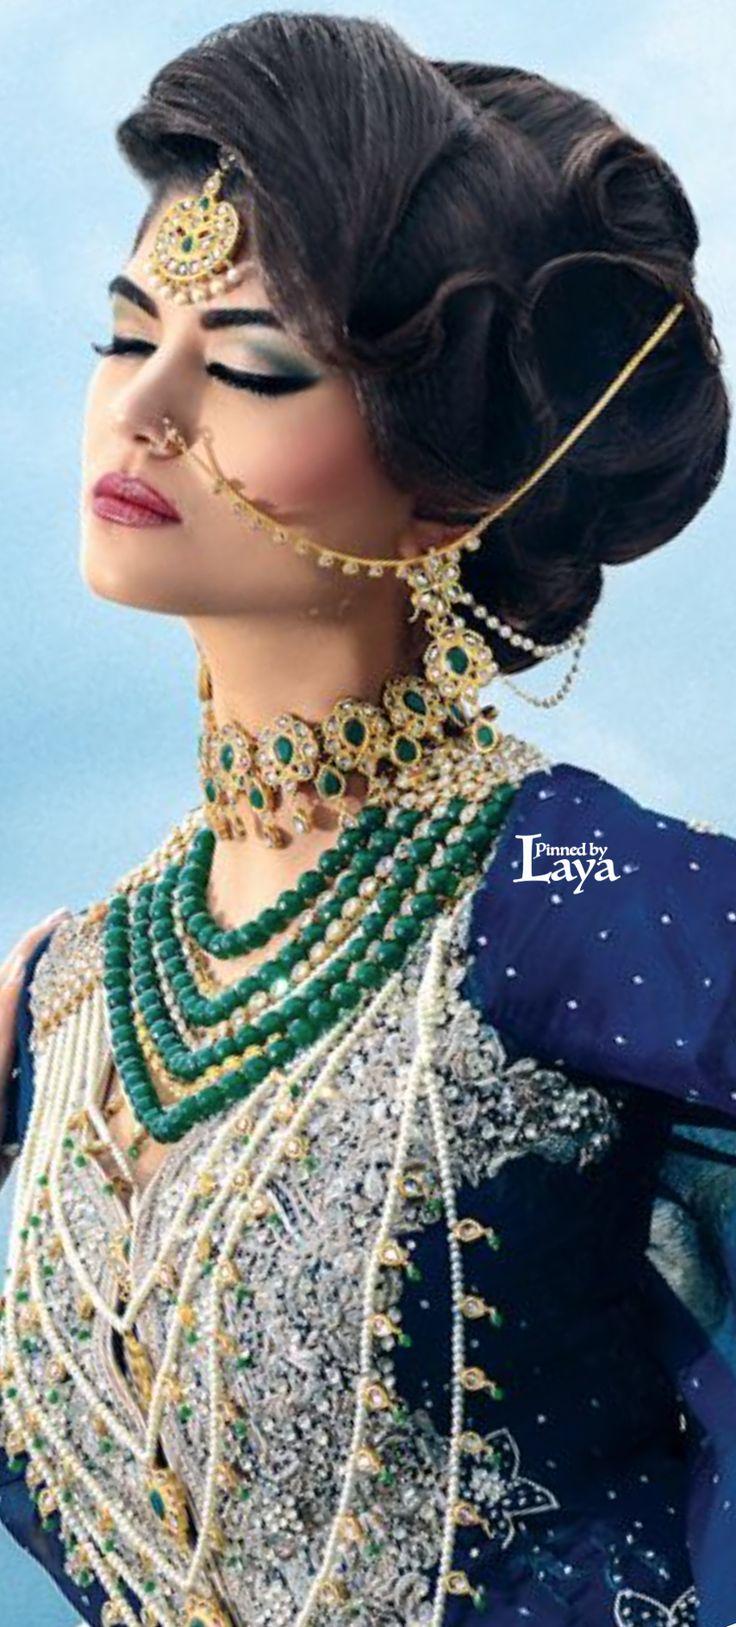 Worst makeup mistakes on your wedding indian bridal diaries -  Laya Indian Bride